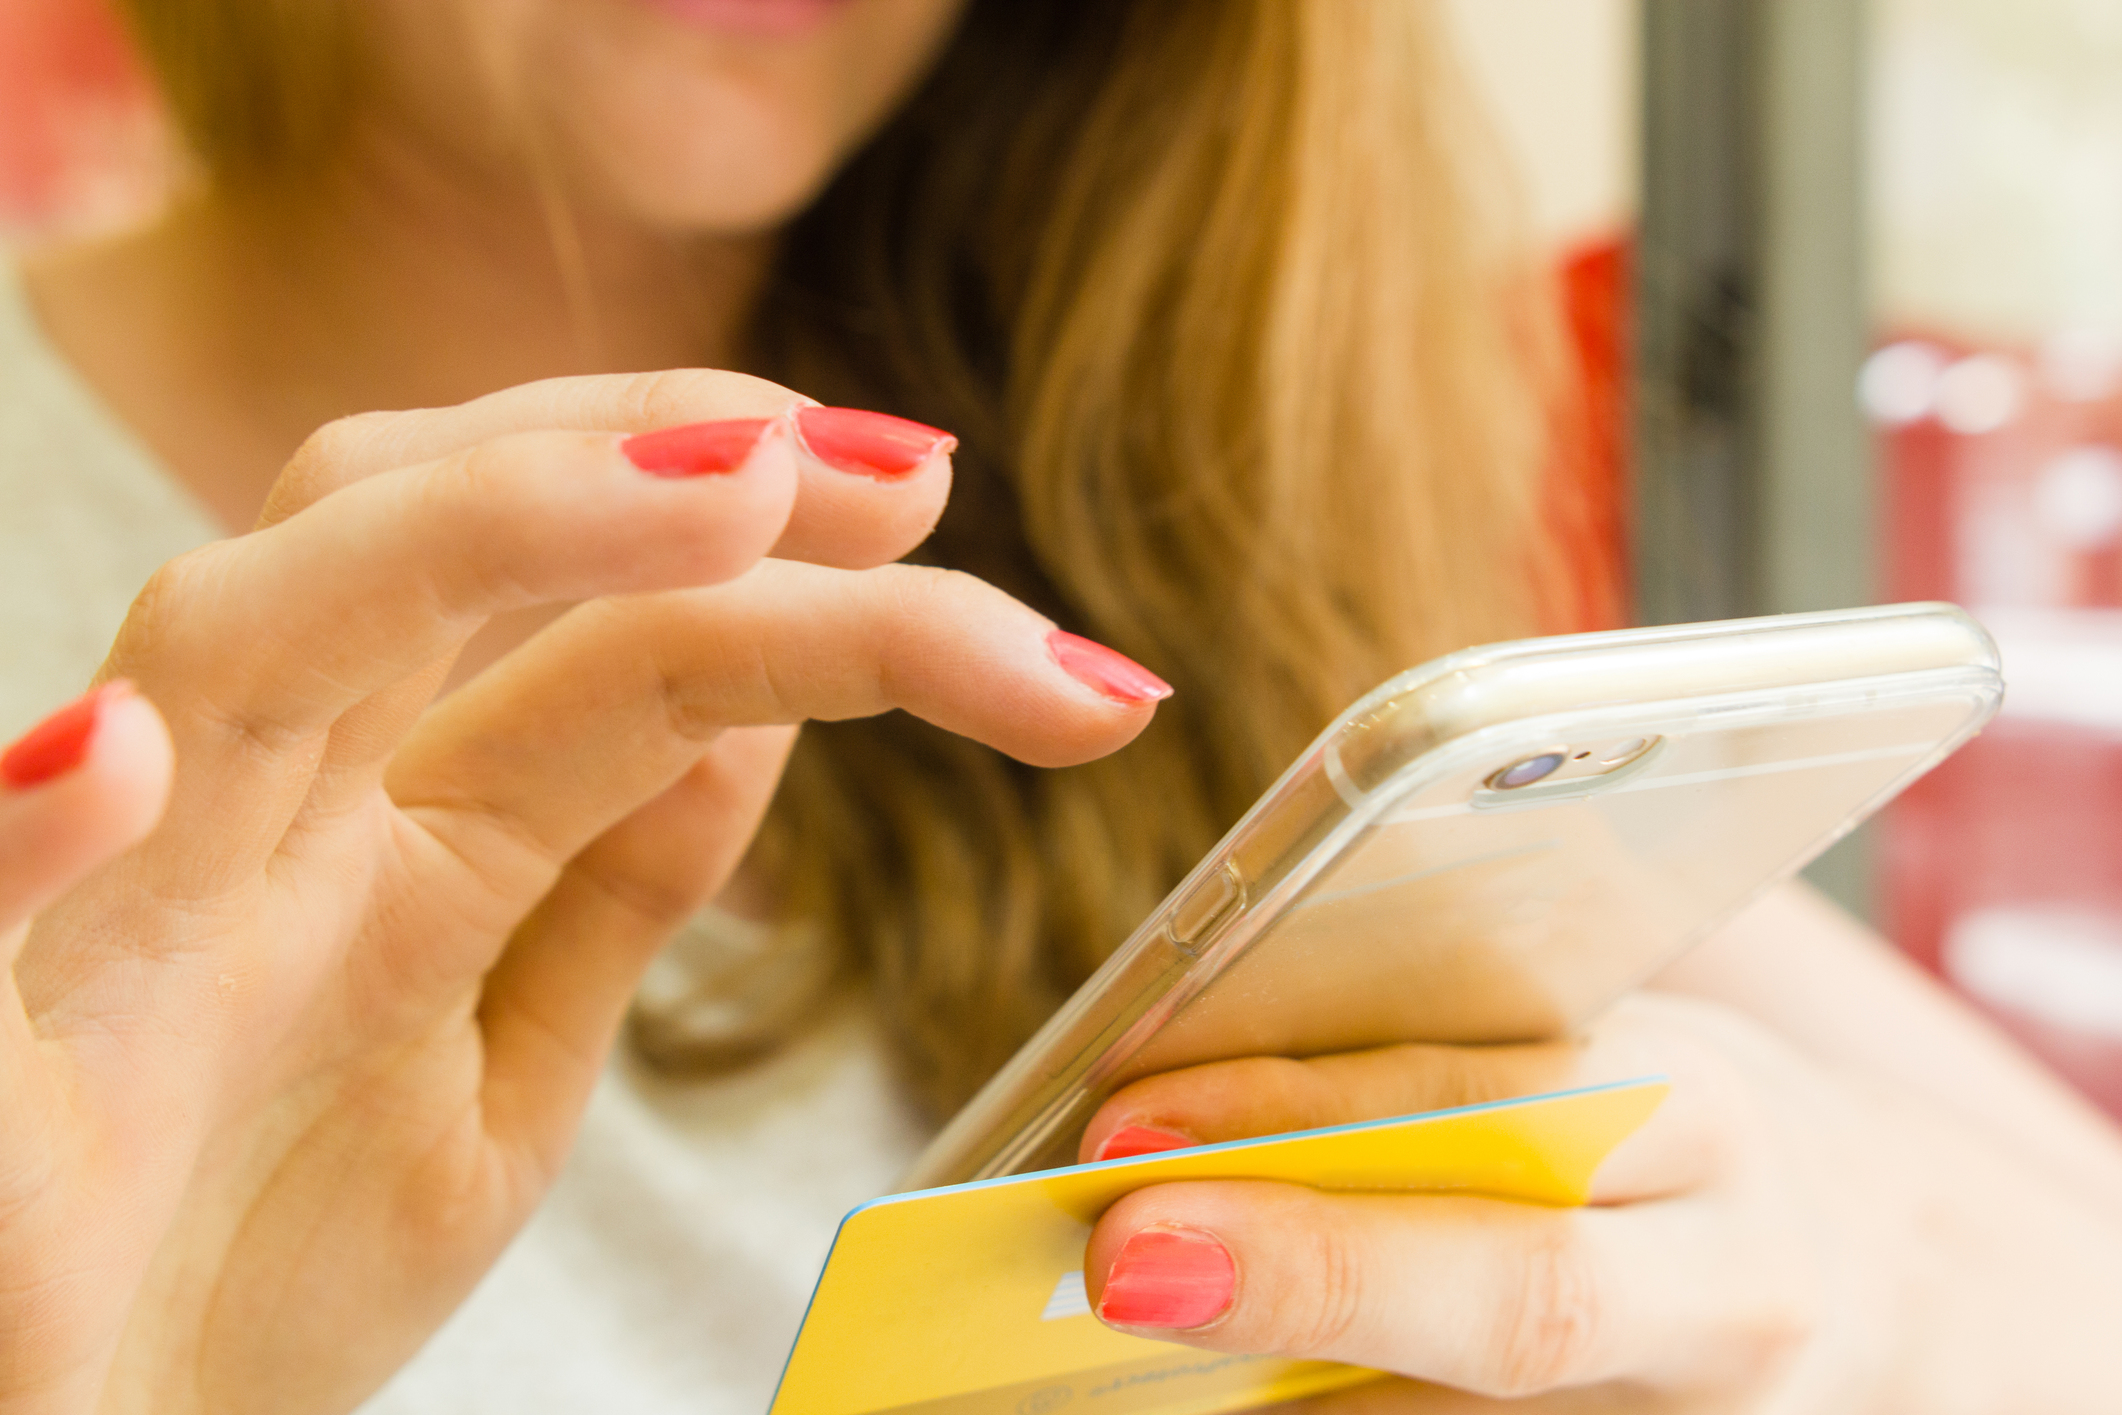 telefon, bankowość mobilna